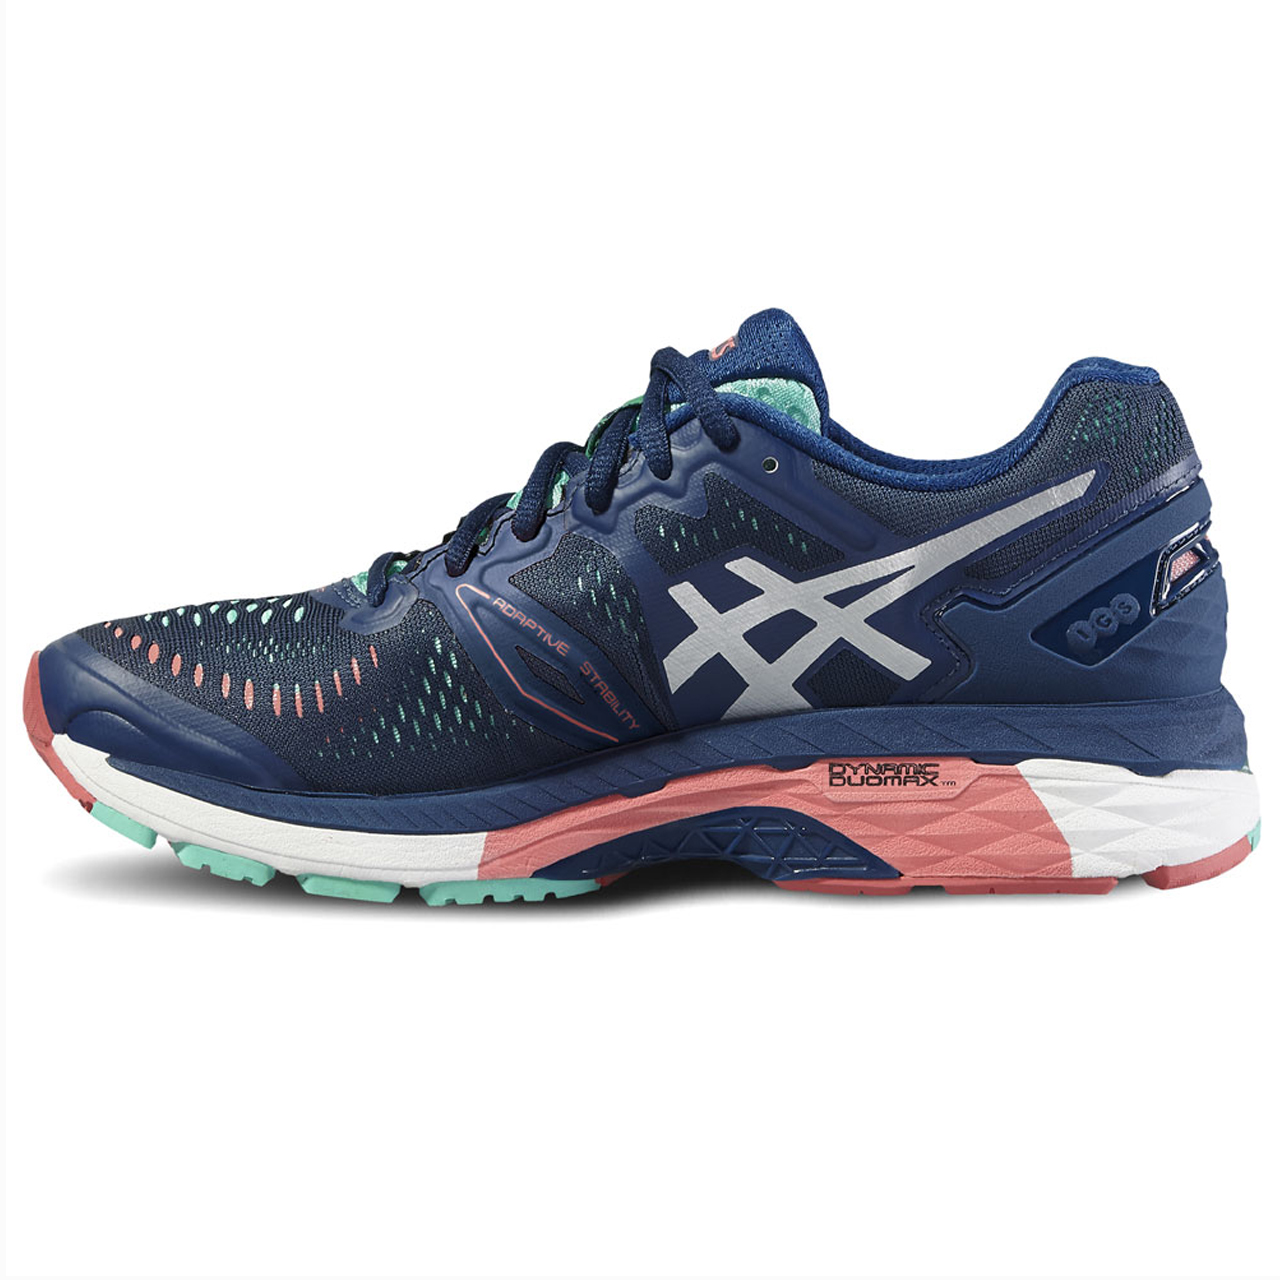 کفش مخصوص دویدن زنانه اسیکس مدل kayano کد 834-079